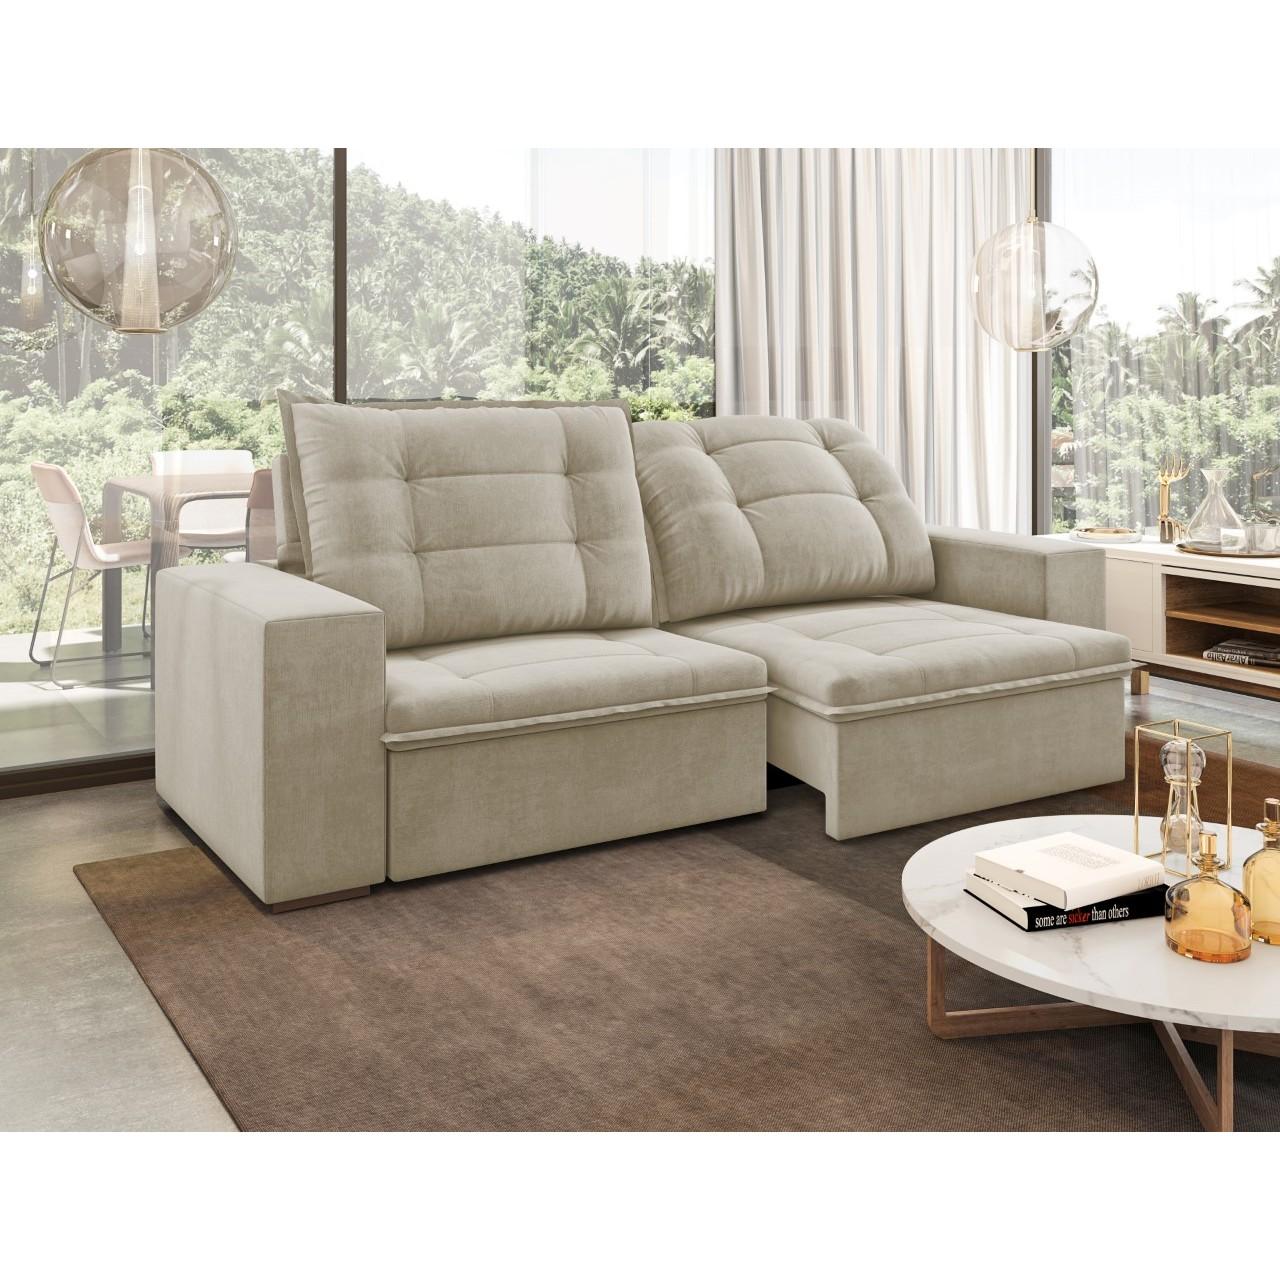 Sofa Ariel 2 Lugares Retratil Reclinavel Veludo 101X98X54 - Spazzio